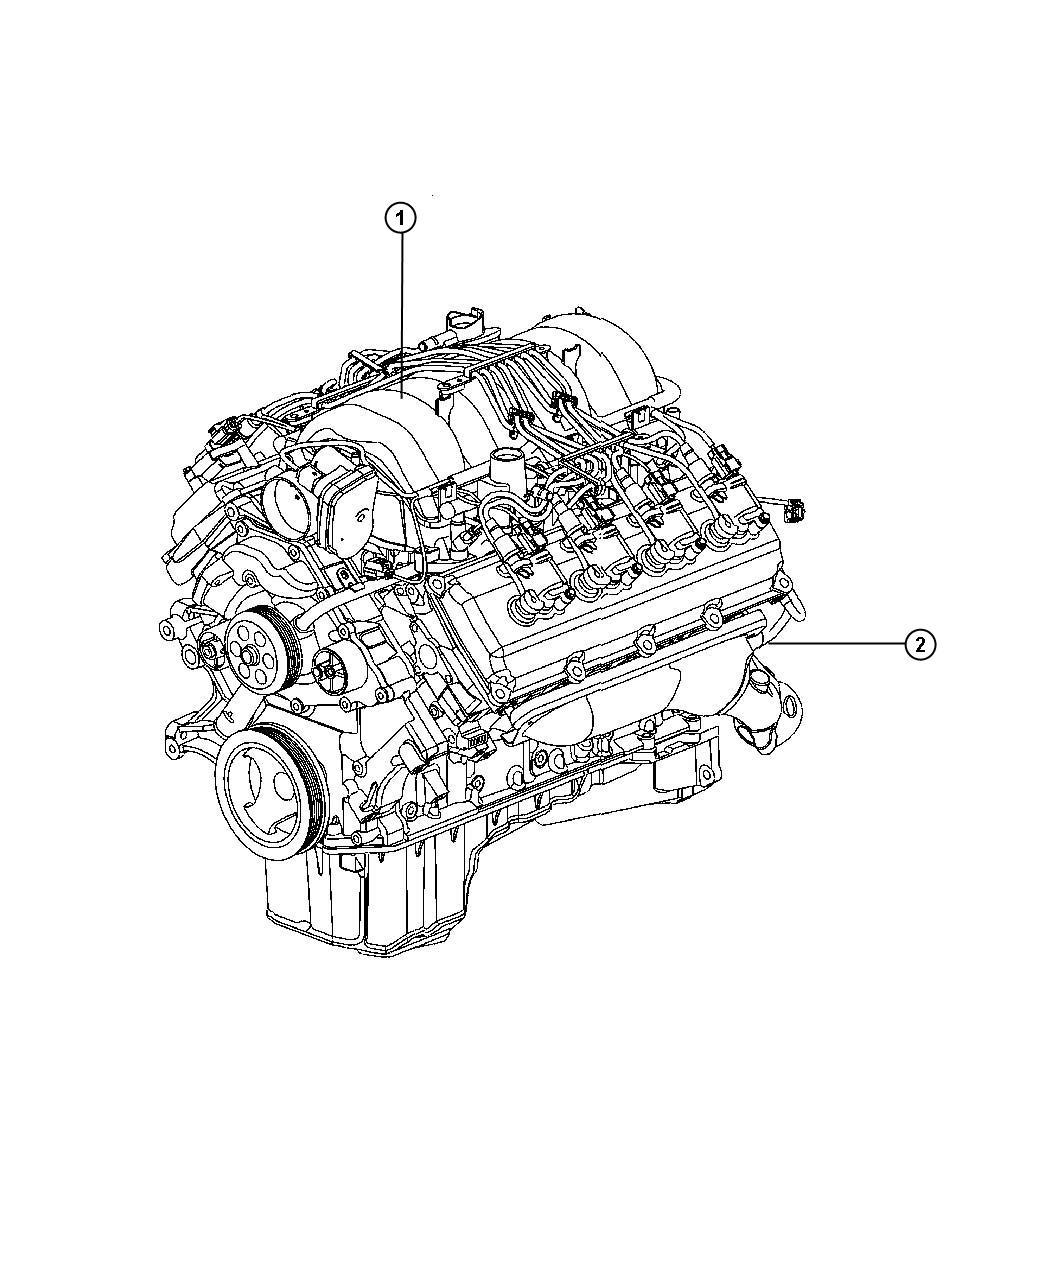 Ram 2500 Engine. Long block. Remanufactured. Manifold